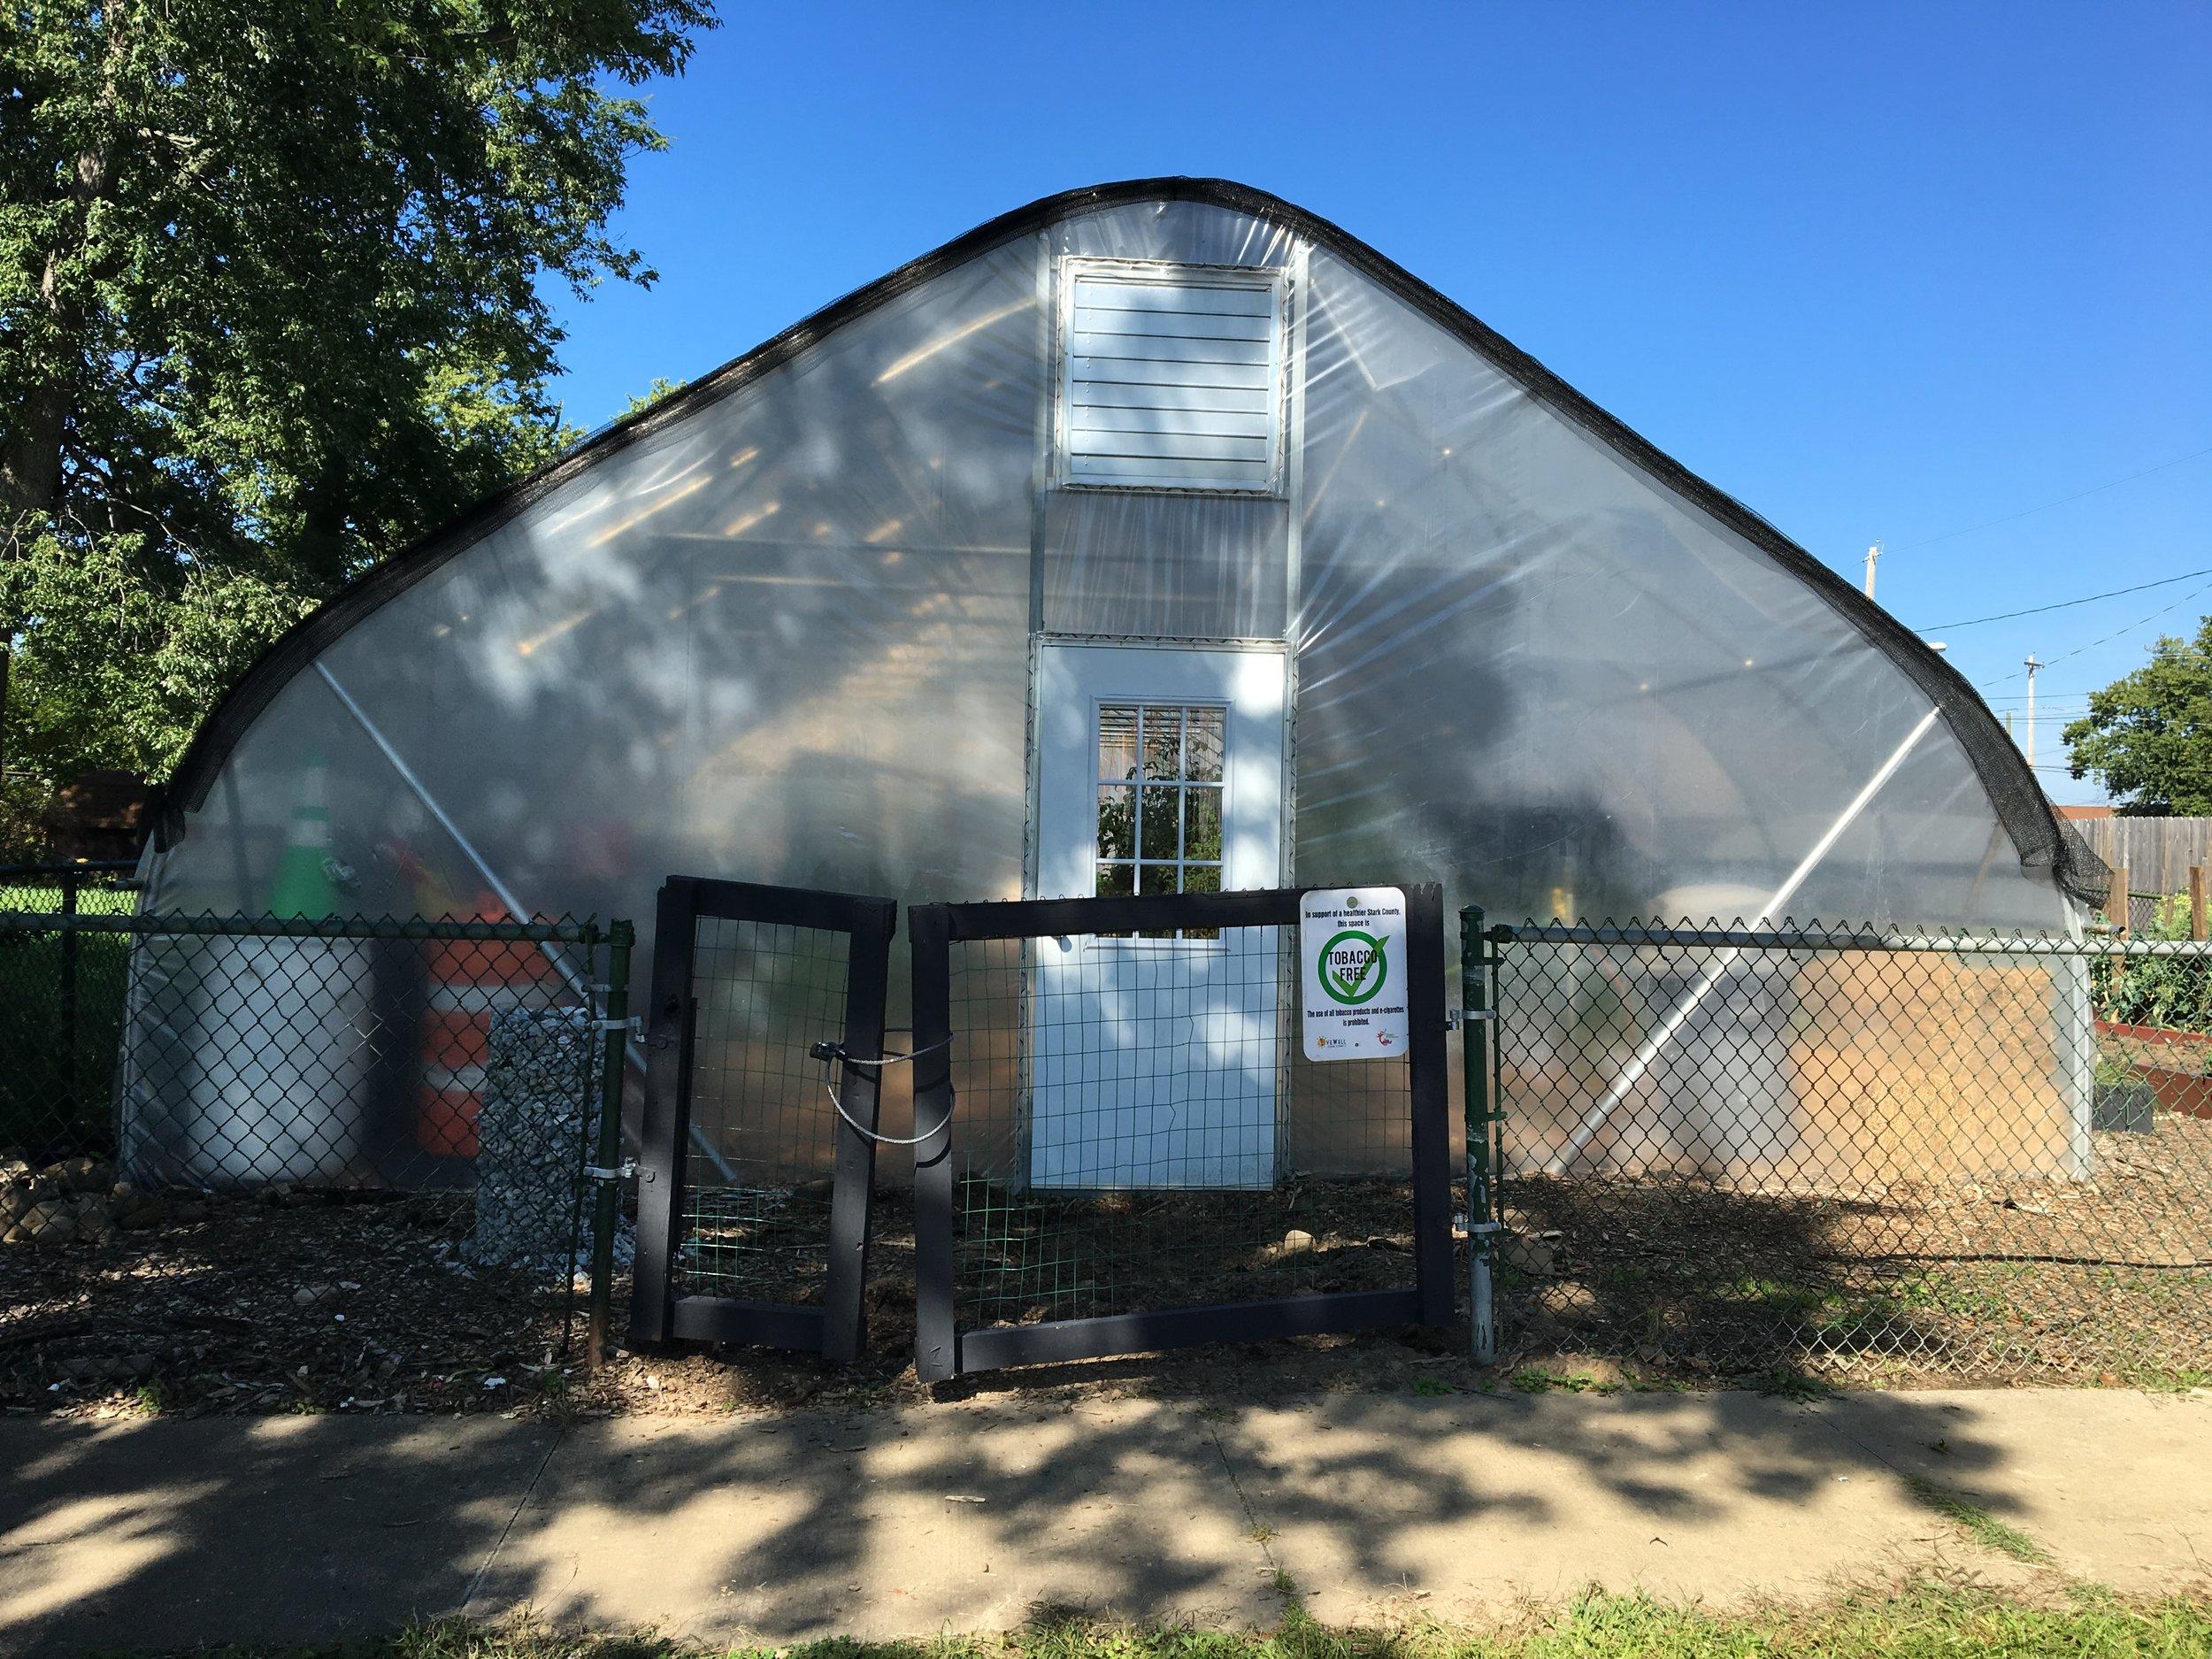 ROW 45 - Community Garden & Shared Use at StarkFresh Food Production_3.jpeg